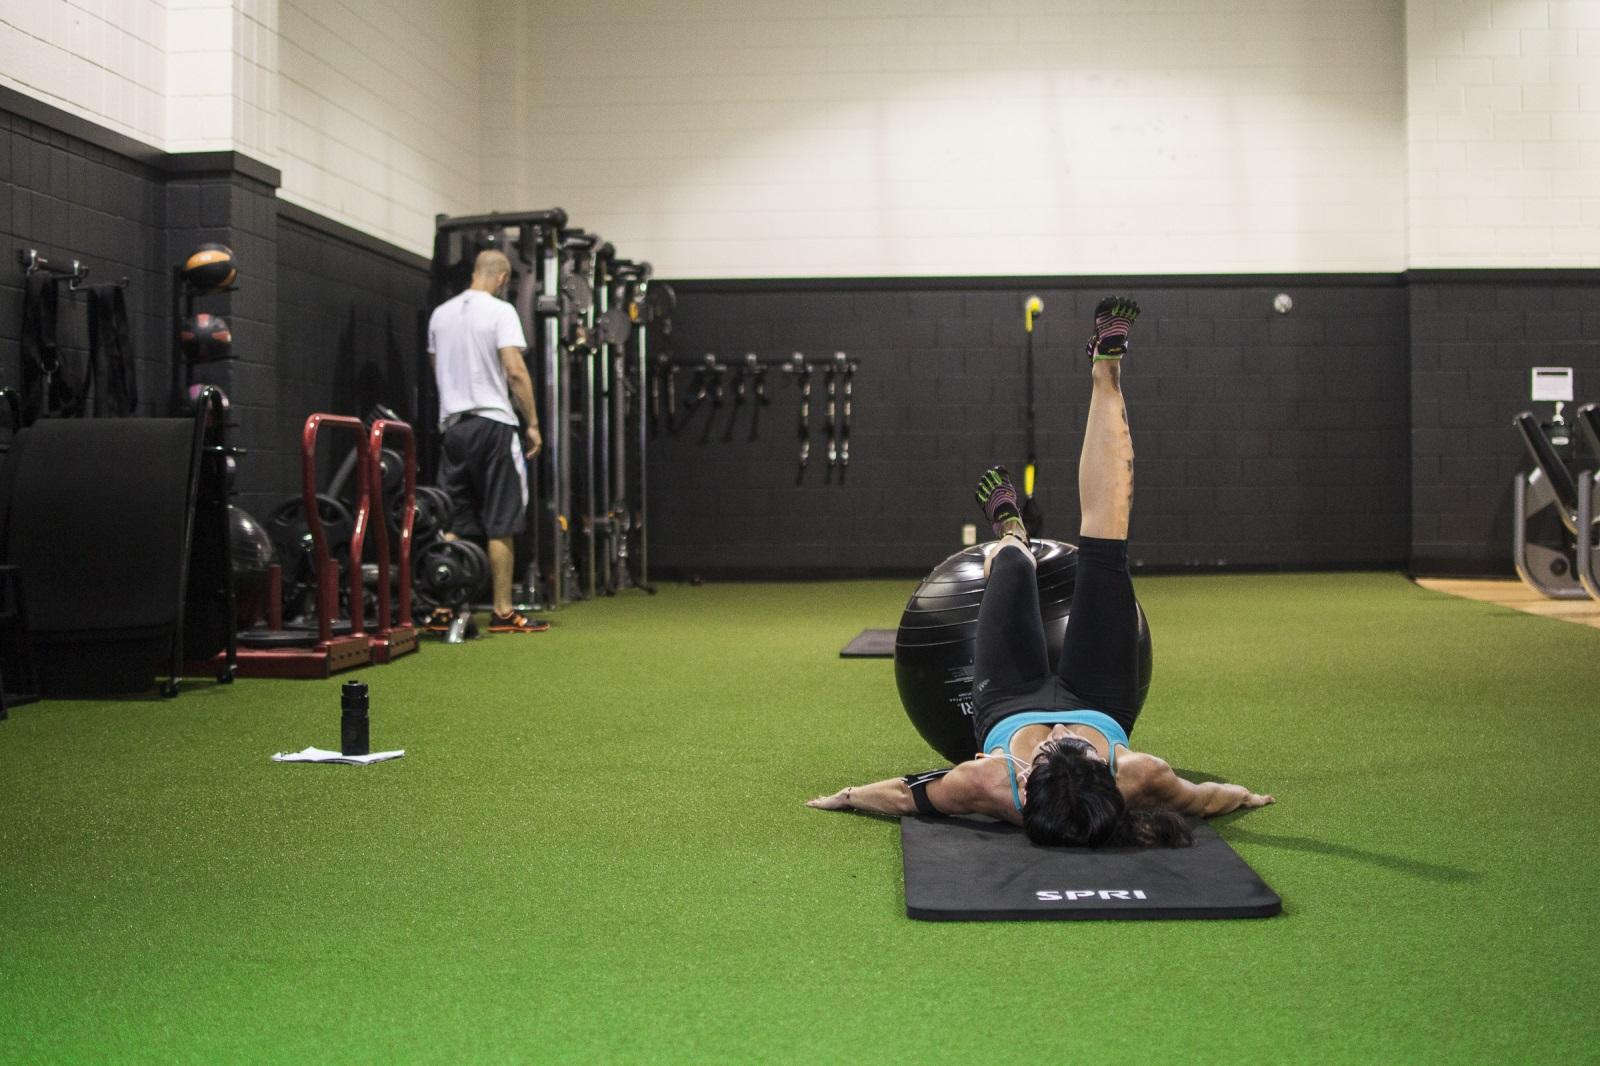 Turf Area Saint Paul Athletic Club Workout Fitness